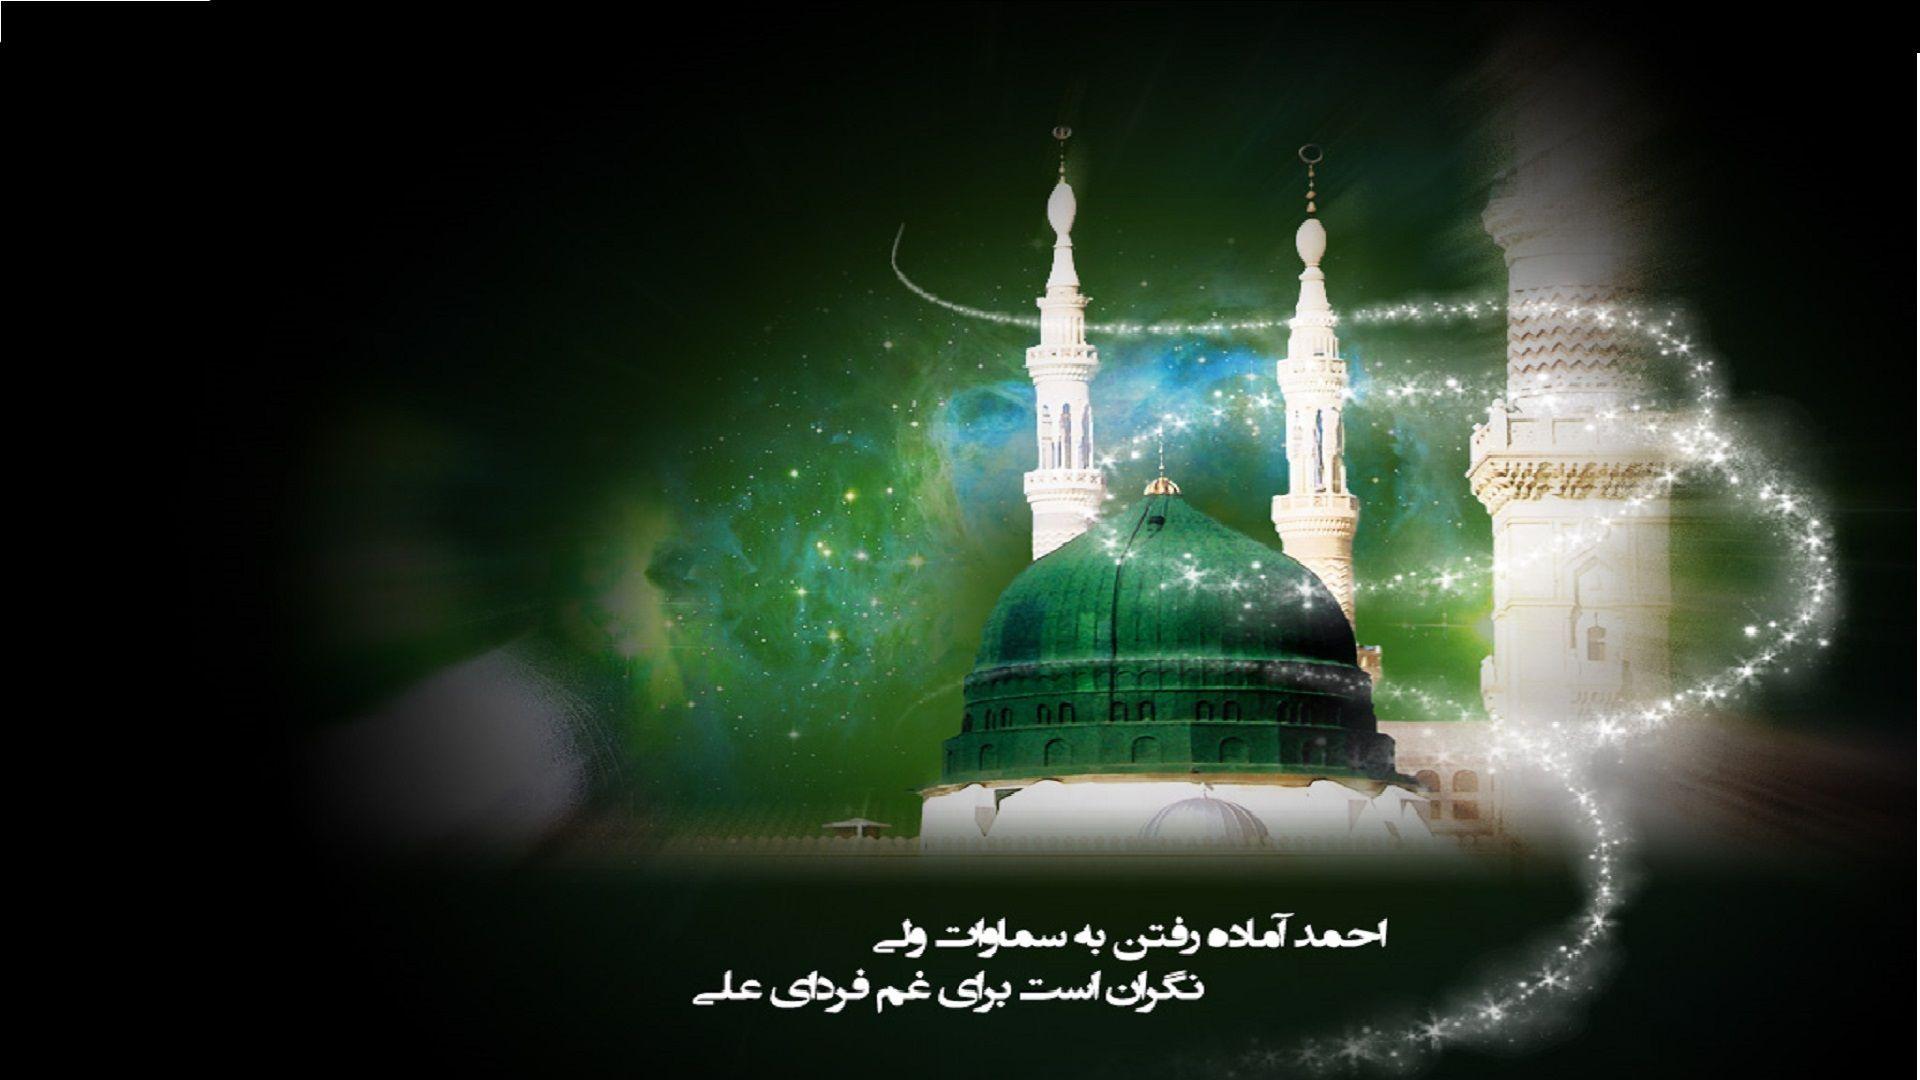 Most Beautiful Wallpaper Free Hd Madina Shareef Hd Wallpapers